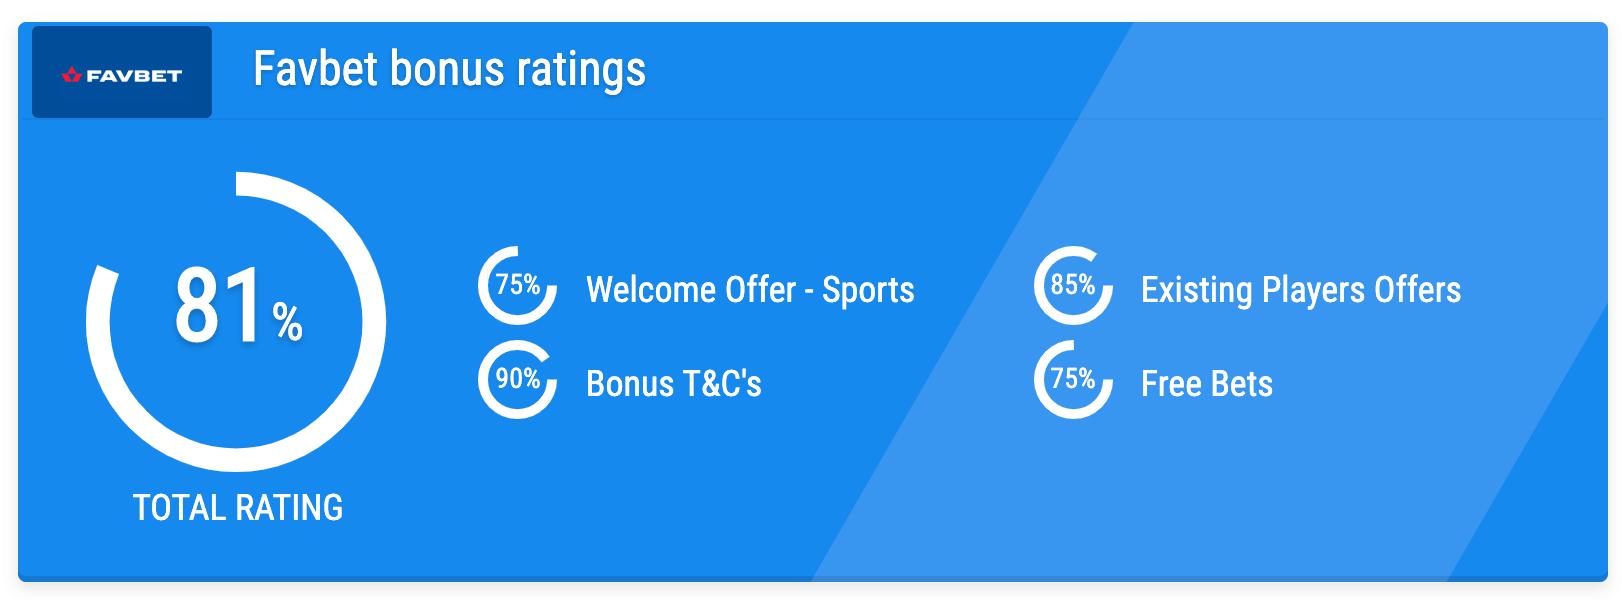 favbet bonus rating